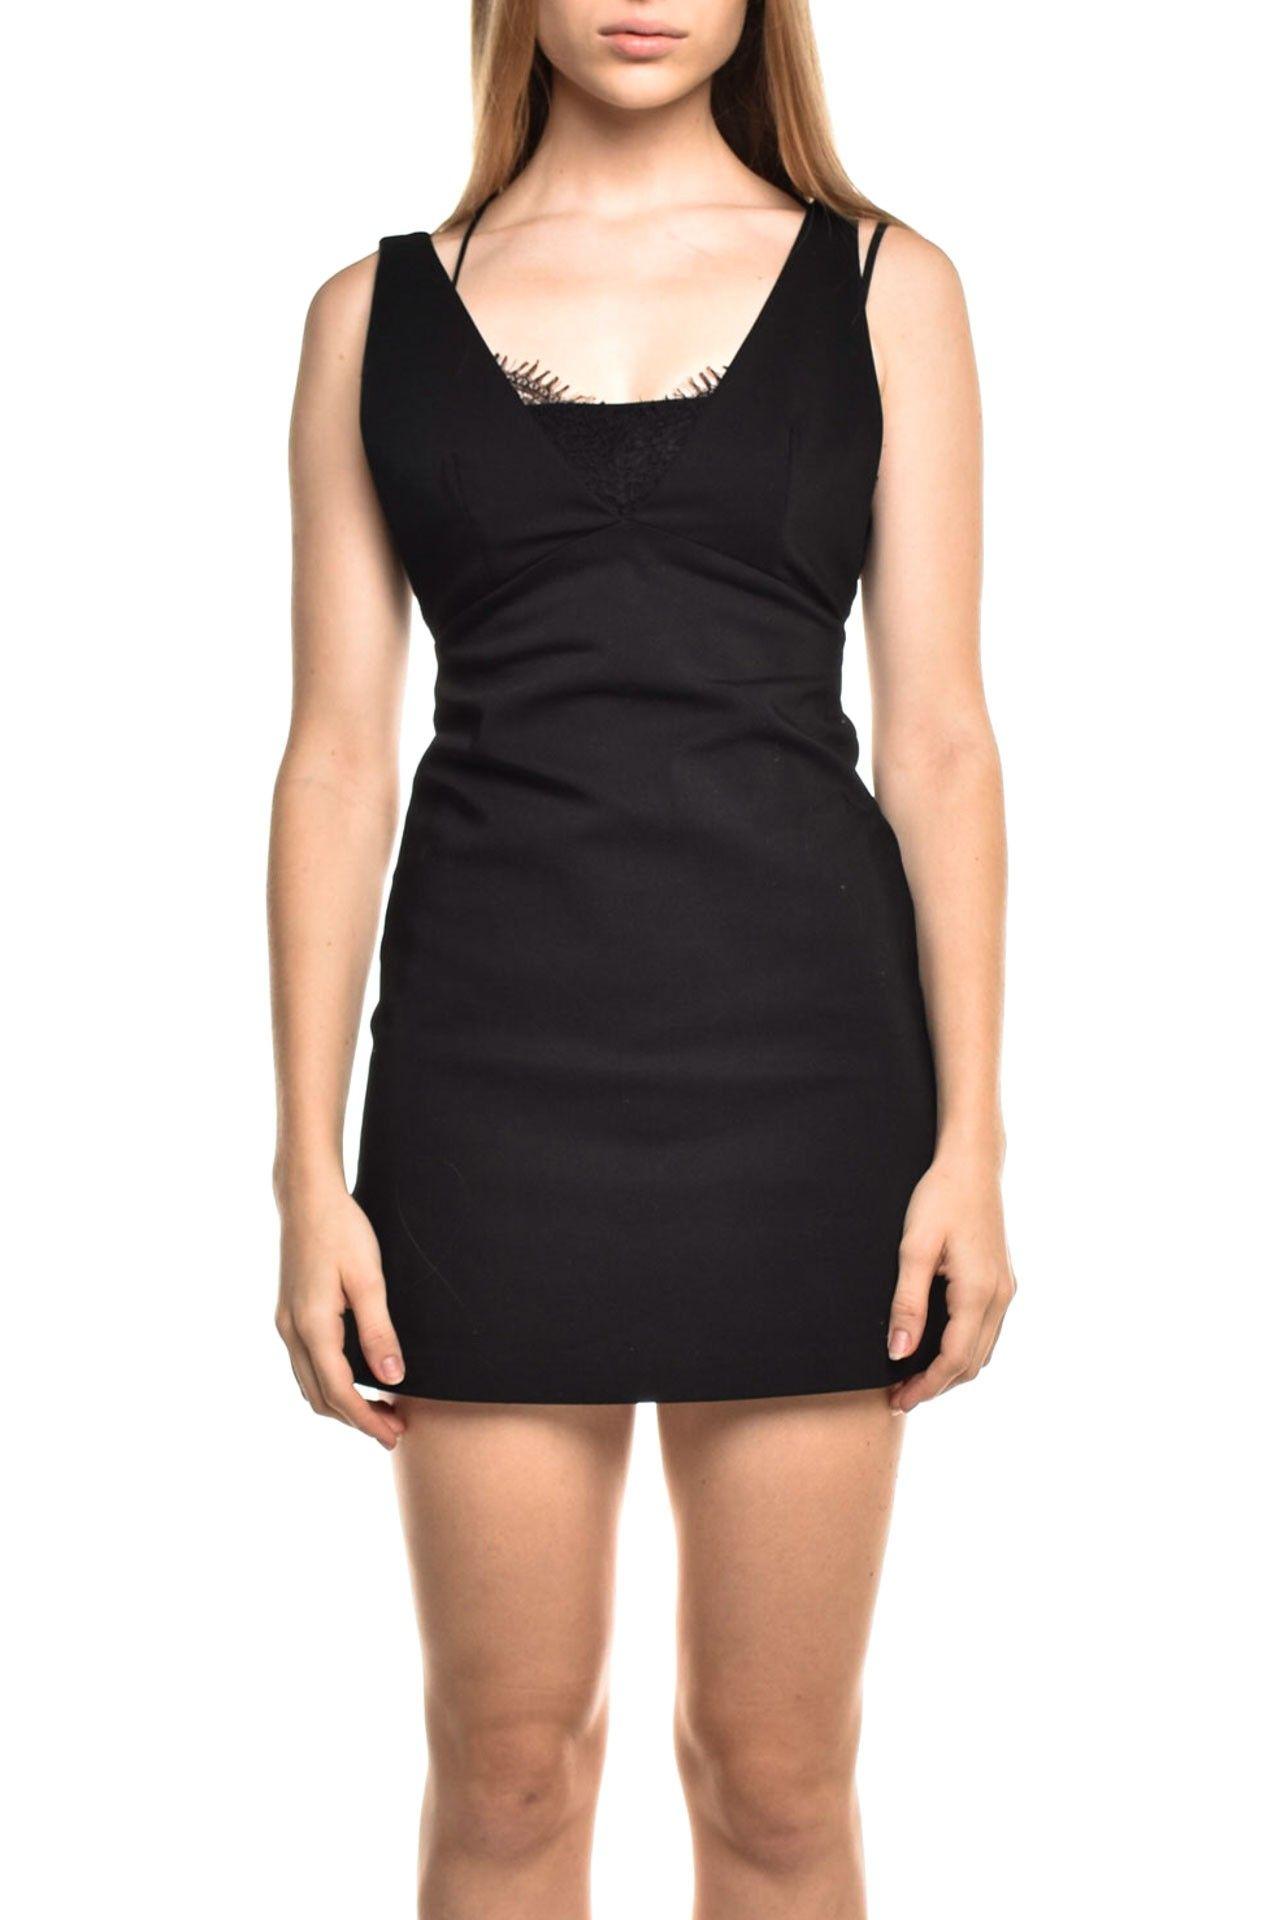 Zara - Vestido Detalhe Renda - Foto 1